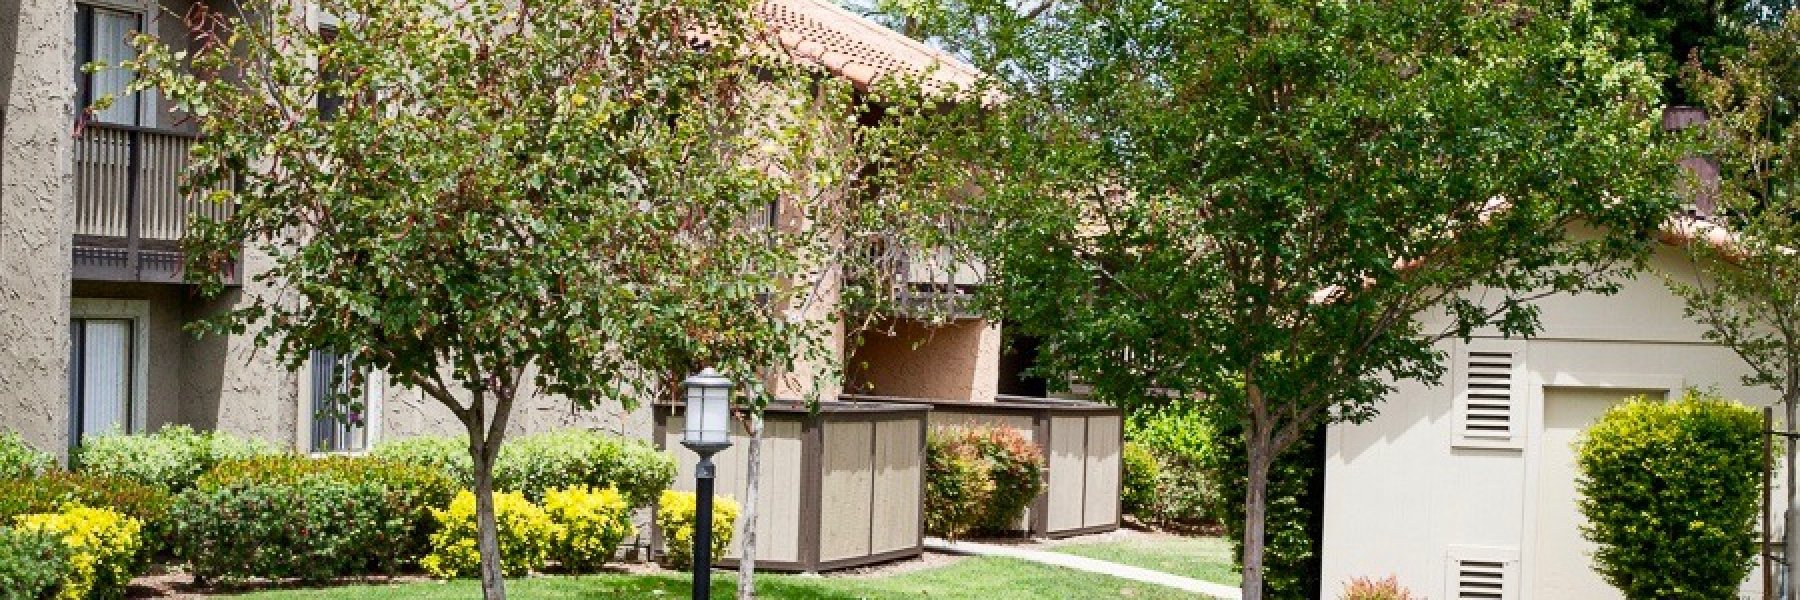 Cantabria is a condo community in San Diego California